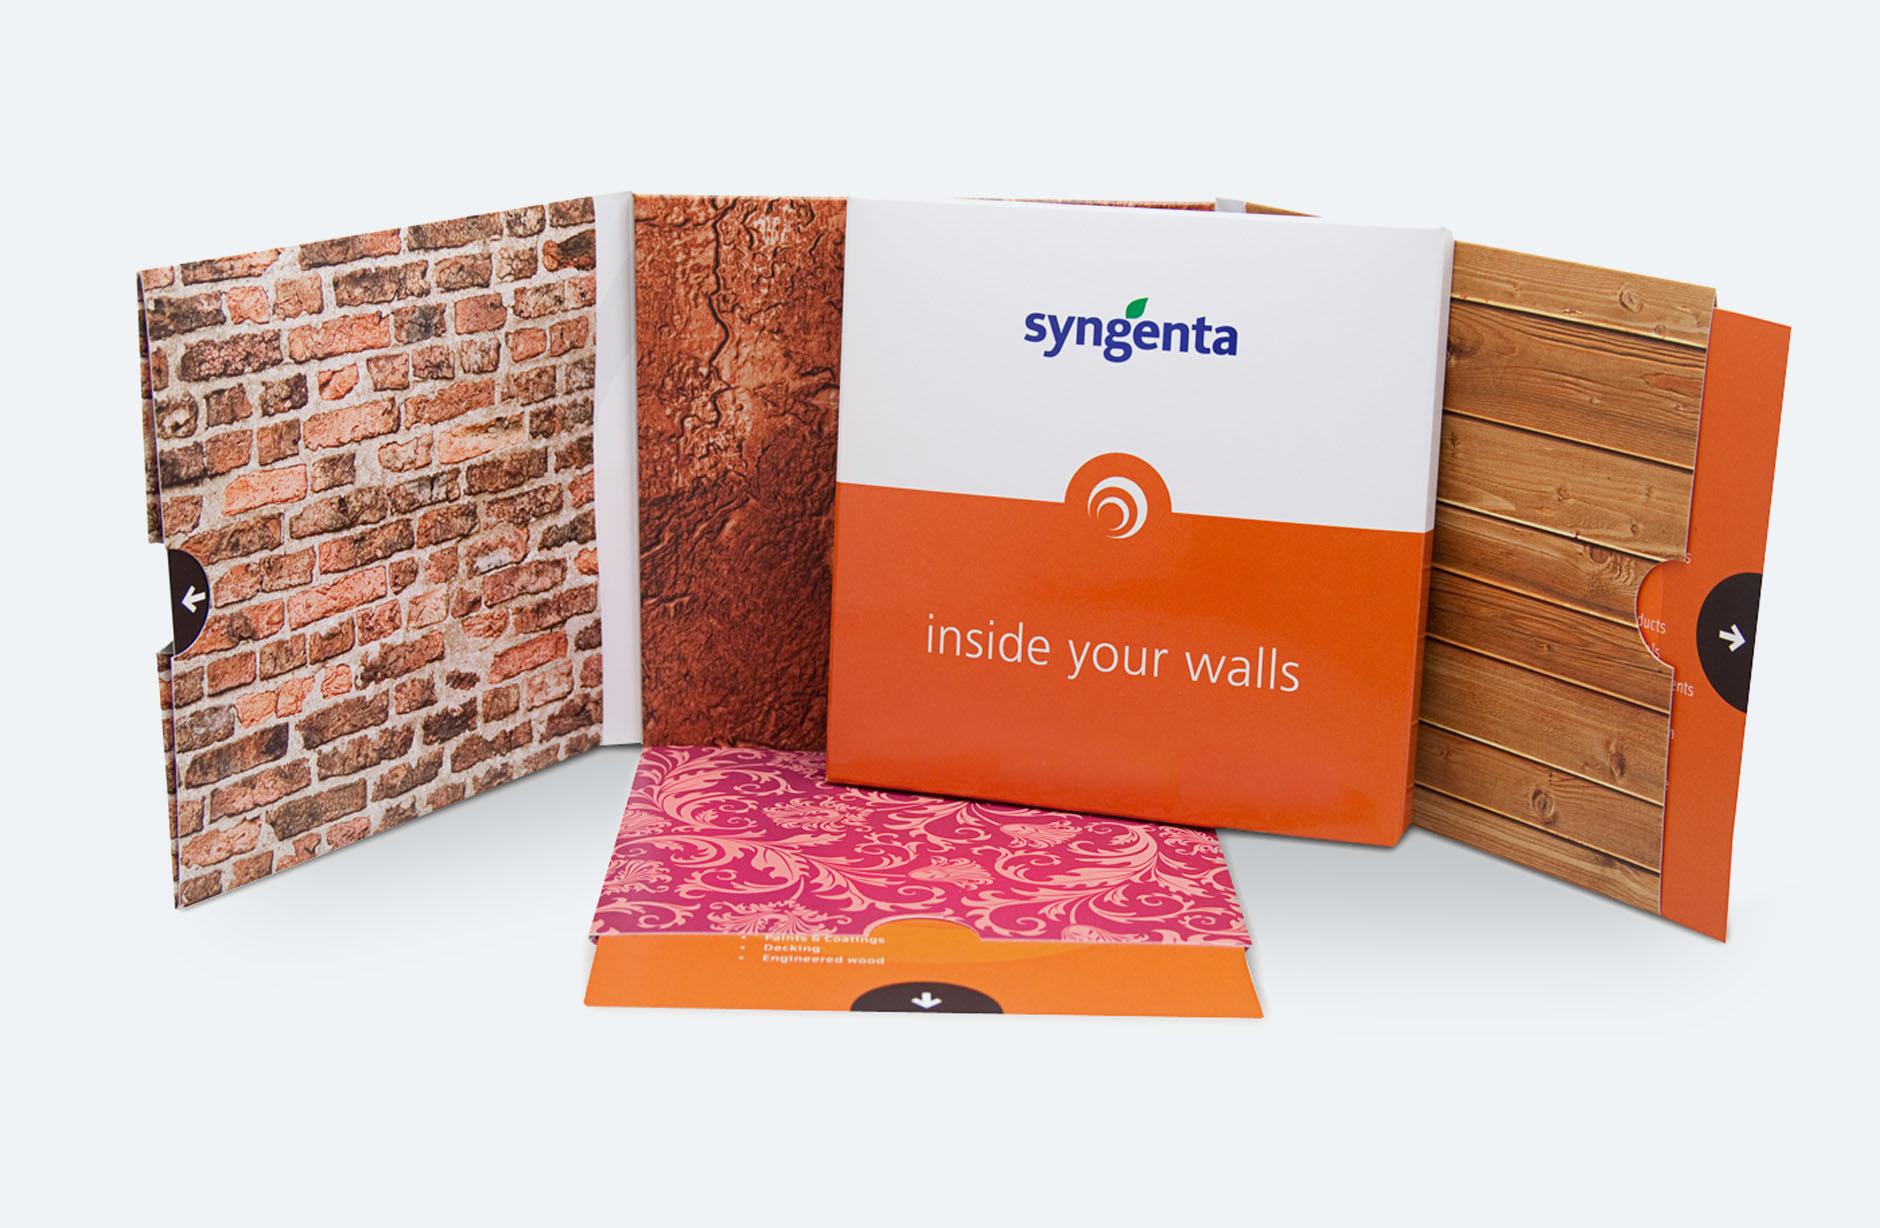 Syngenta inside your walls – Newsign Grafik